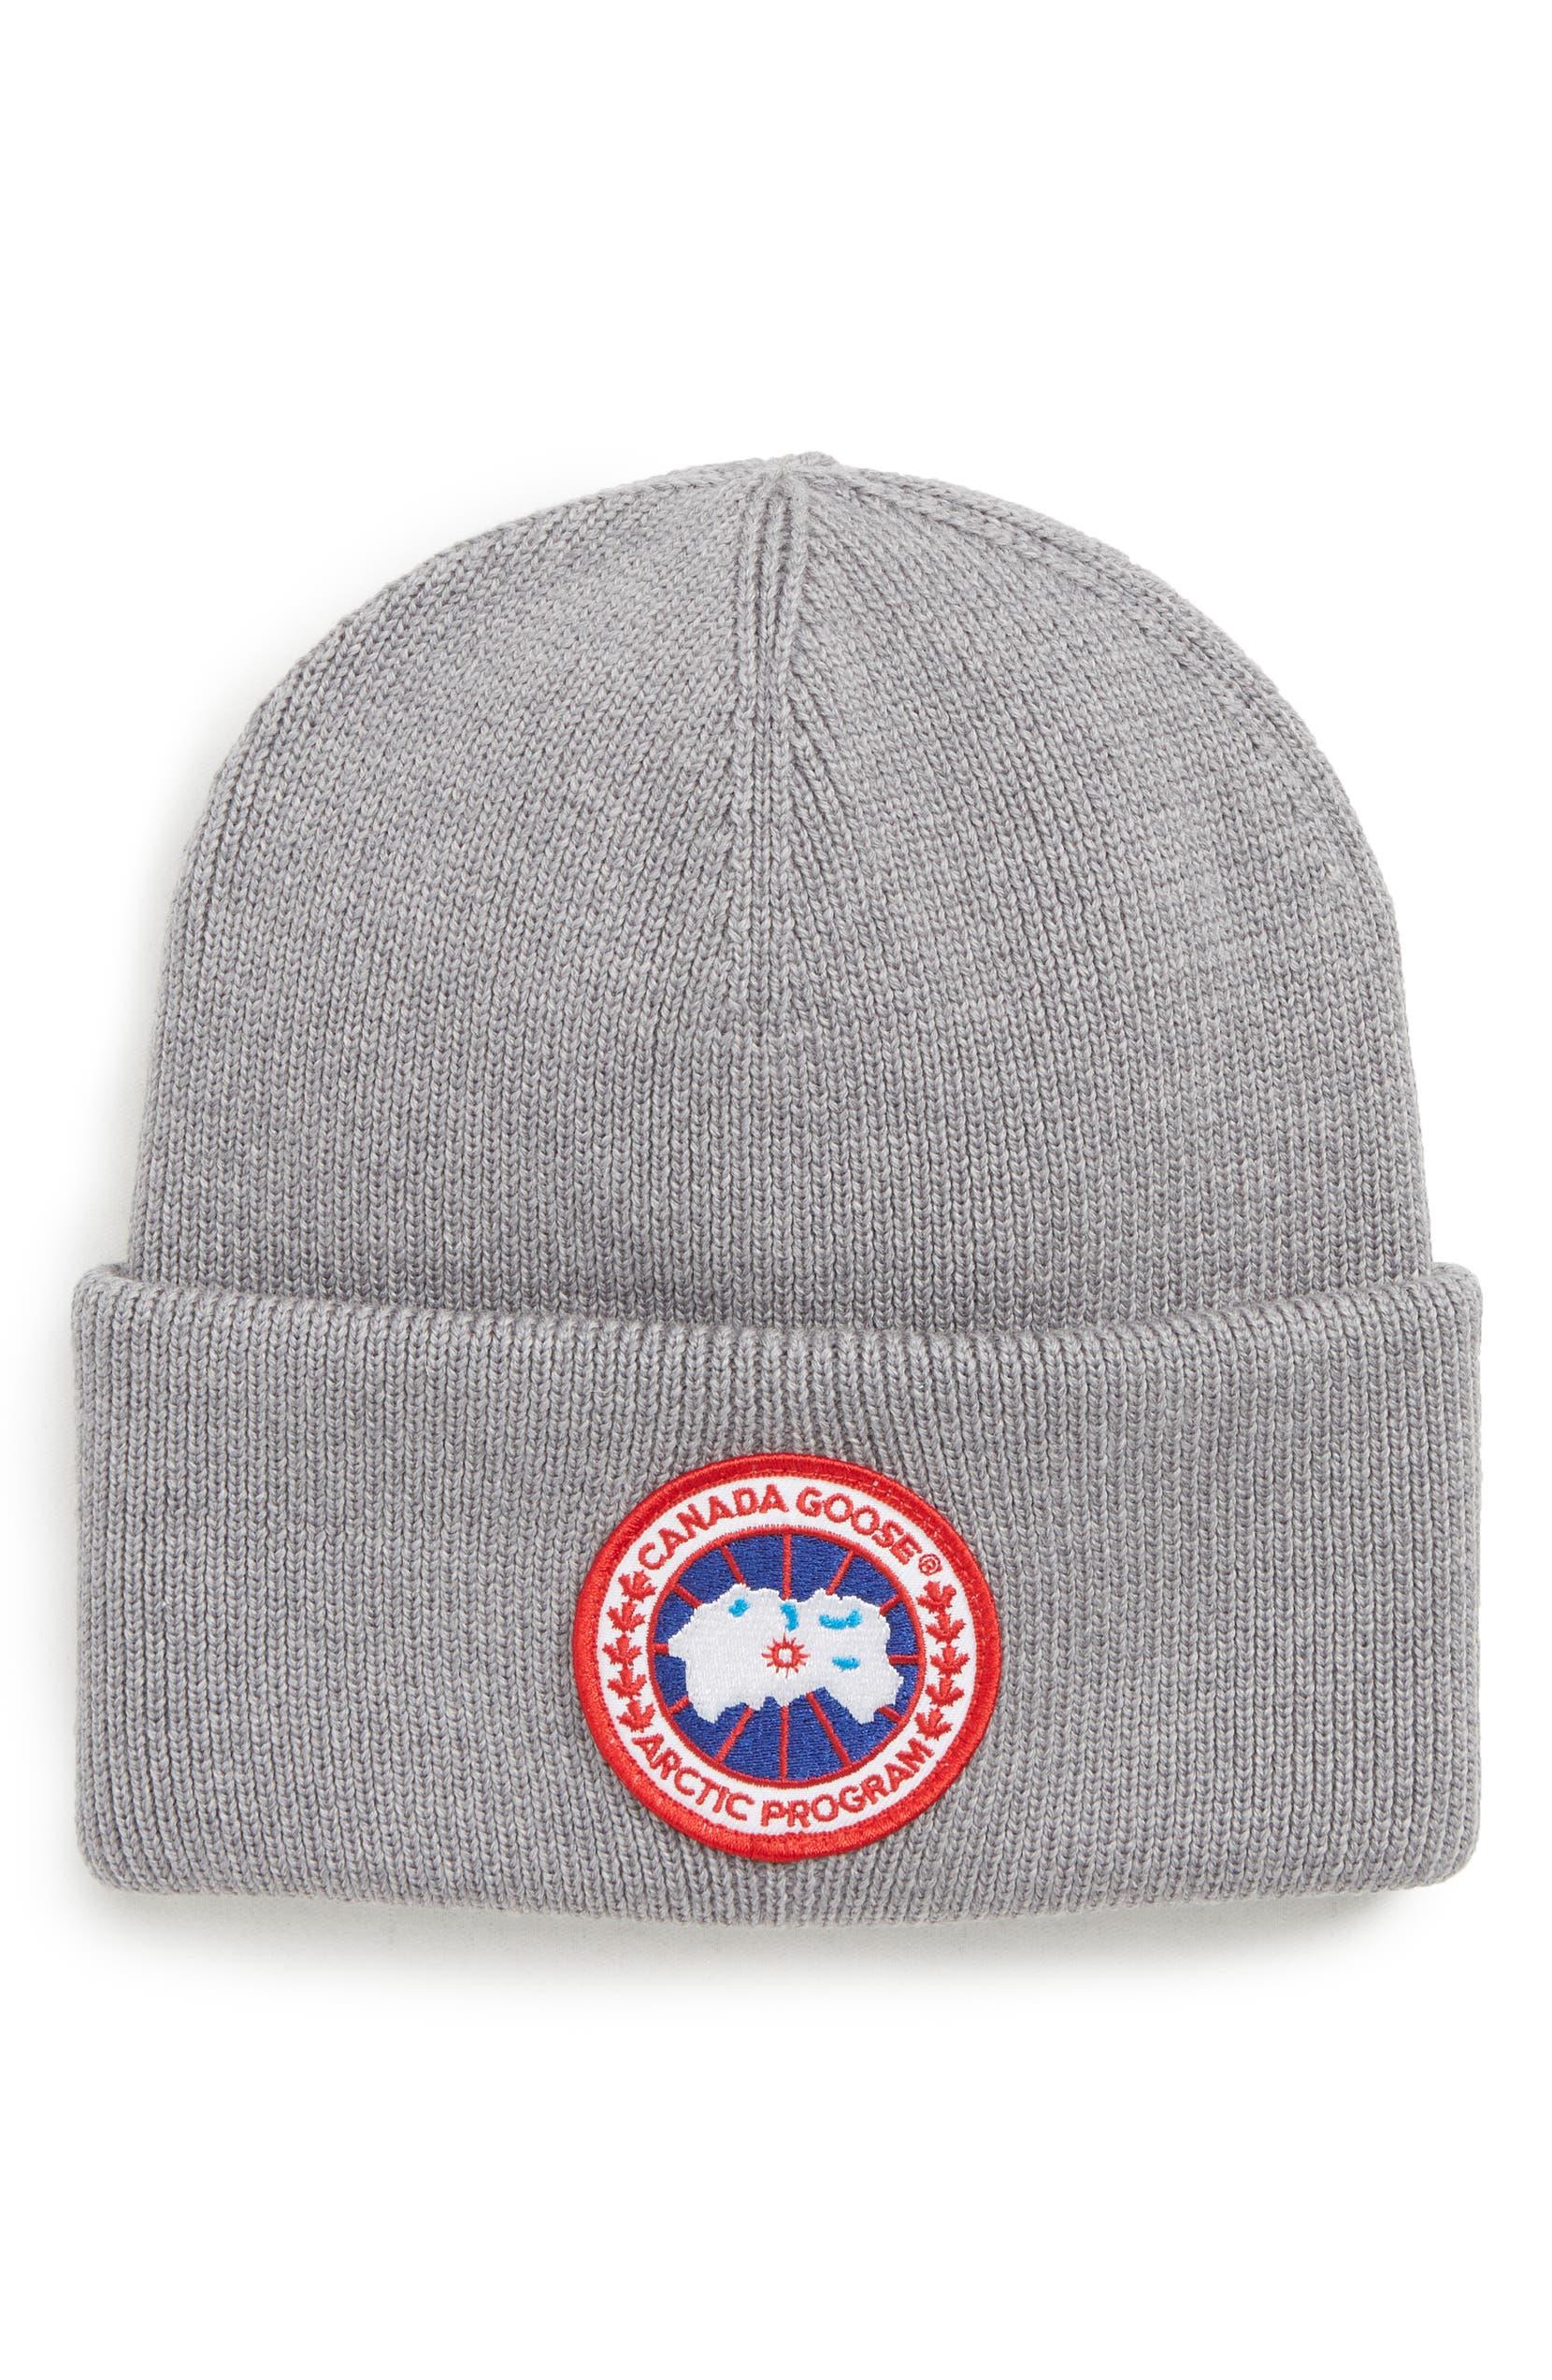 4e41f0227 Arctic Disc Merino Wool Toque Beanie